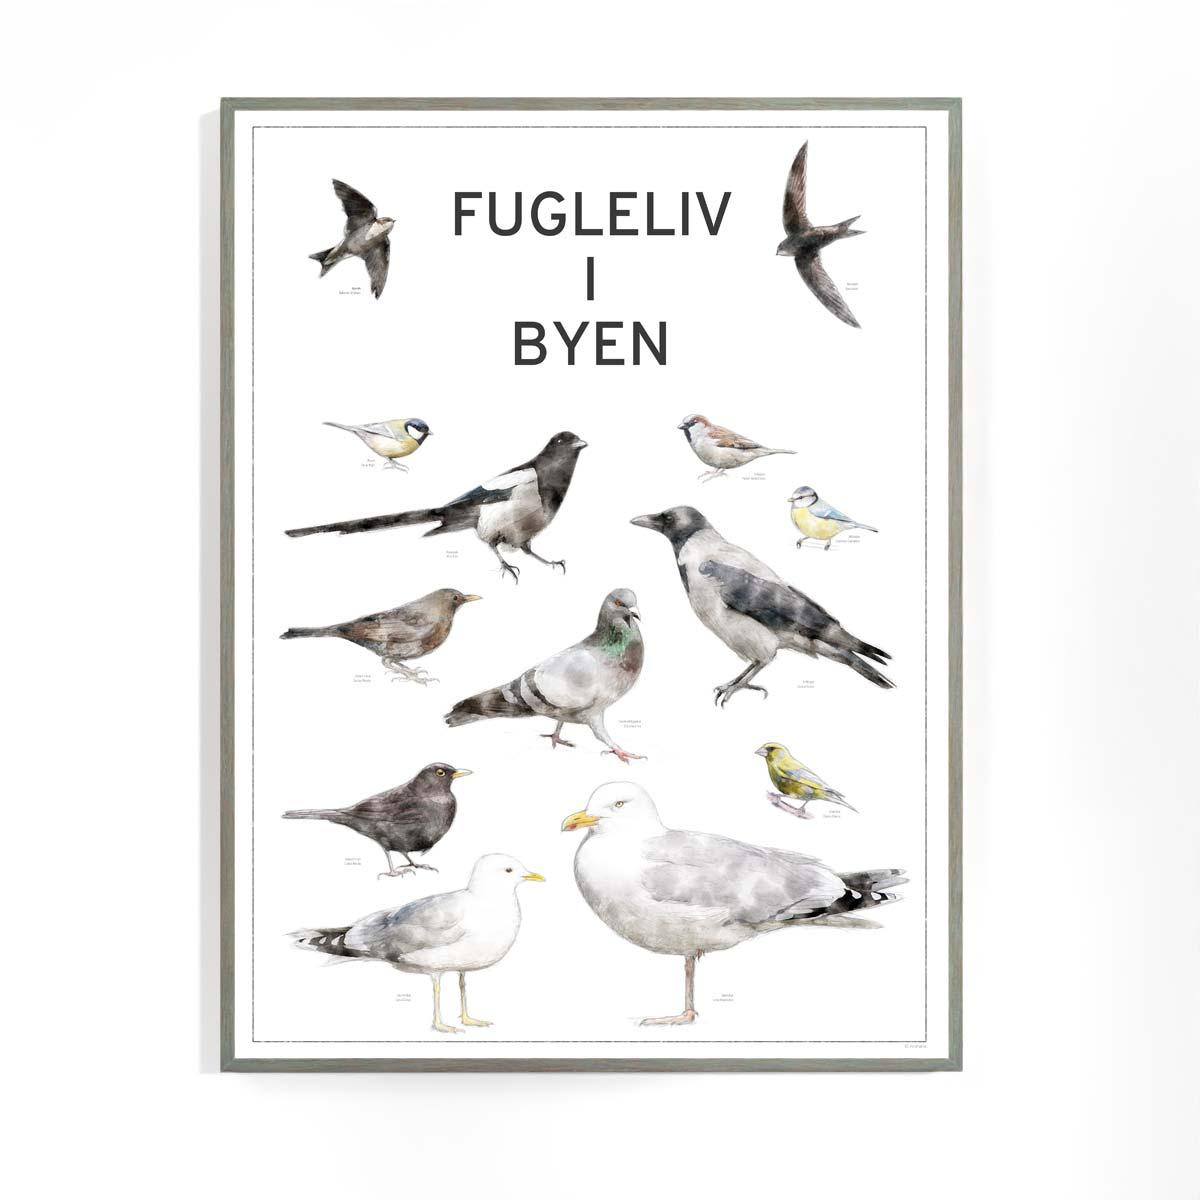 Fugleplakat - Plakat med Fugleliv i byen - 30x40cm version 2